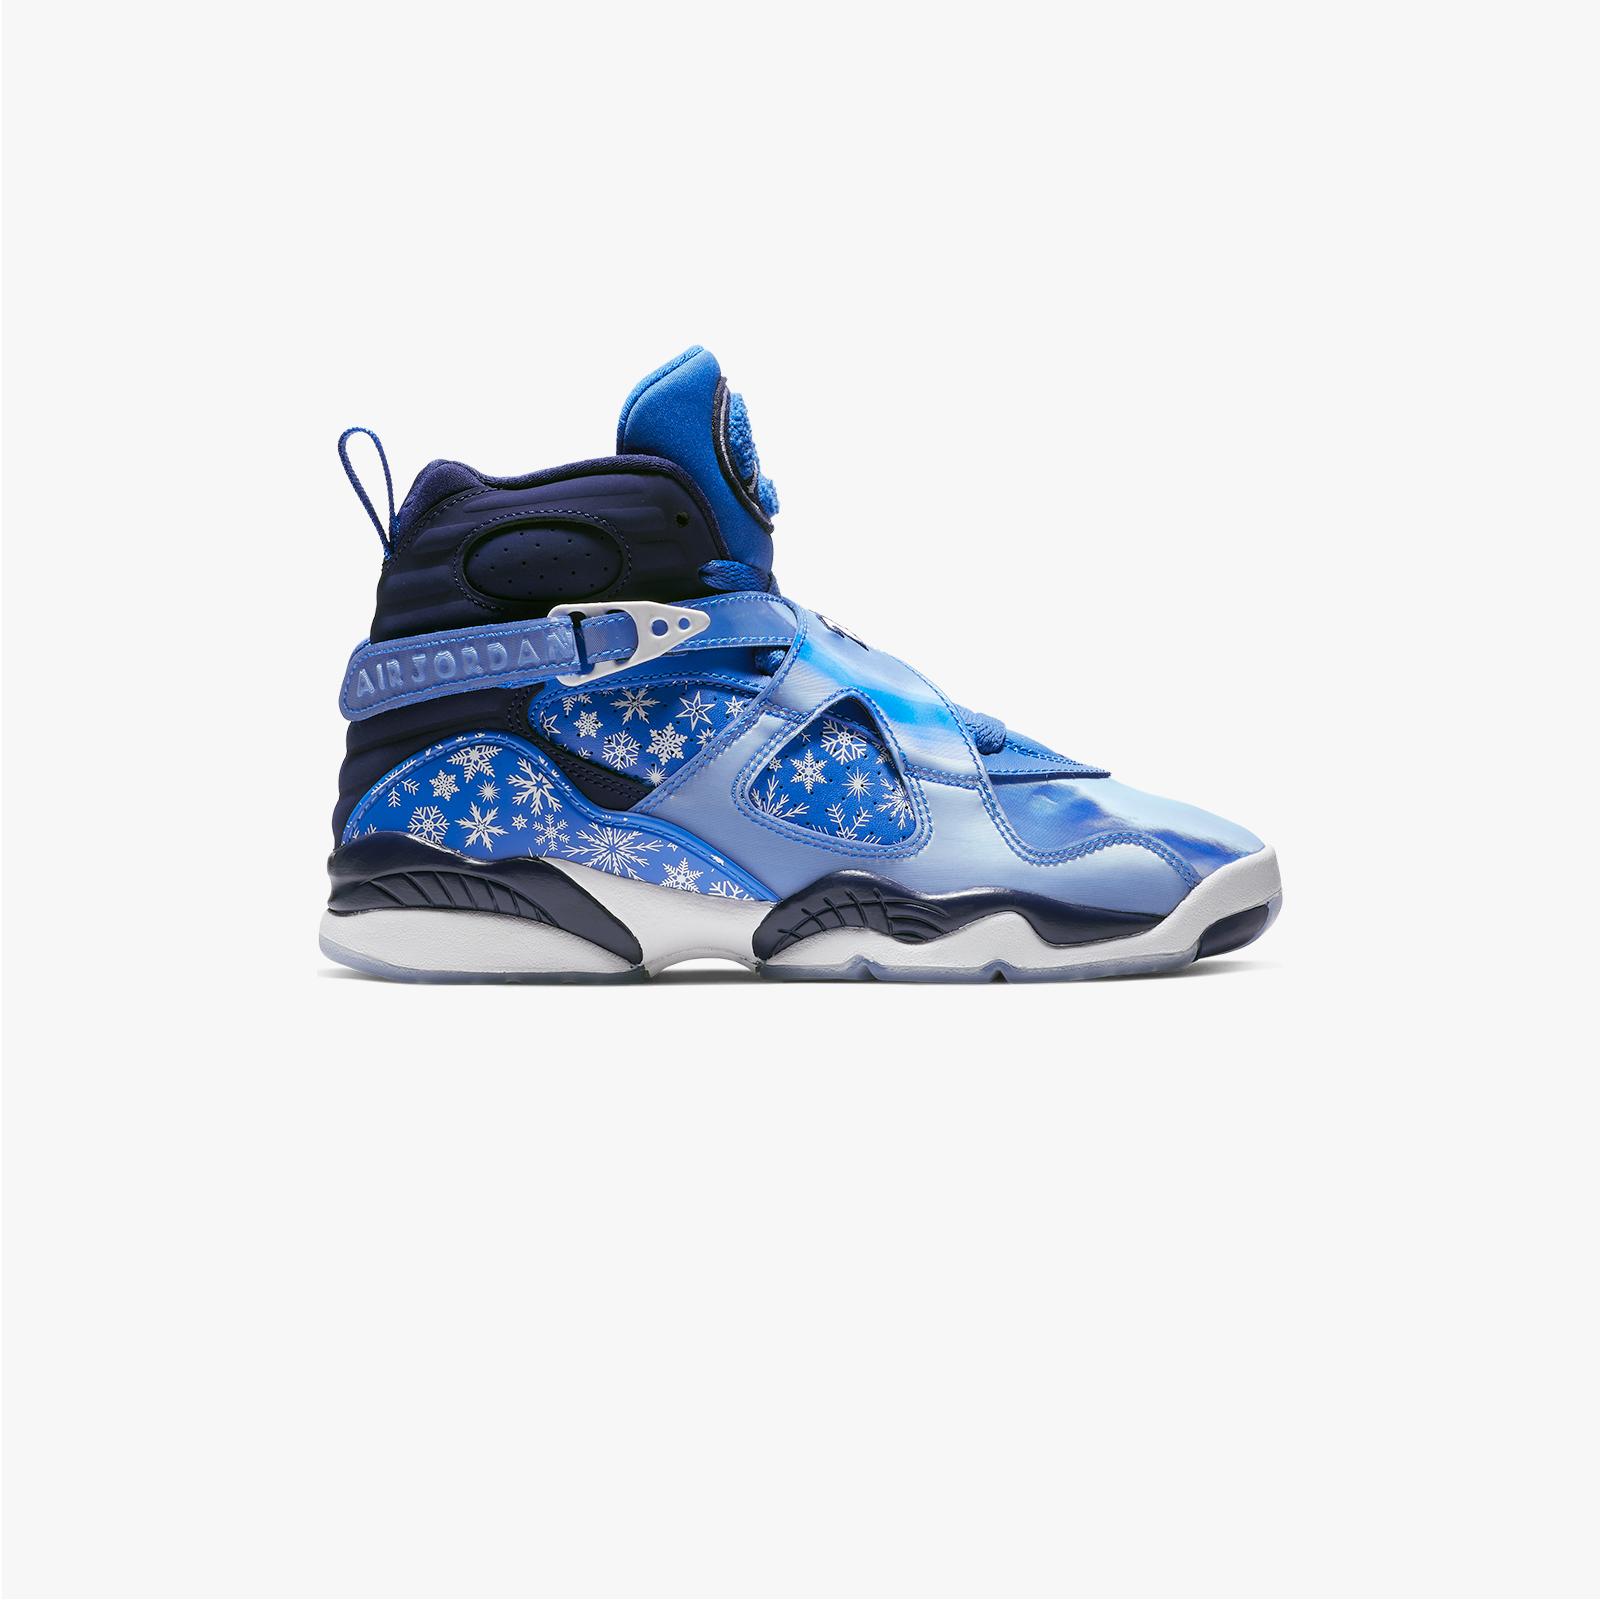 dc1eb14746c0d7 Jordan Brand Wmns Air Jordan 8 Retro - 305368-400 - Sneakersnstuff ...